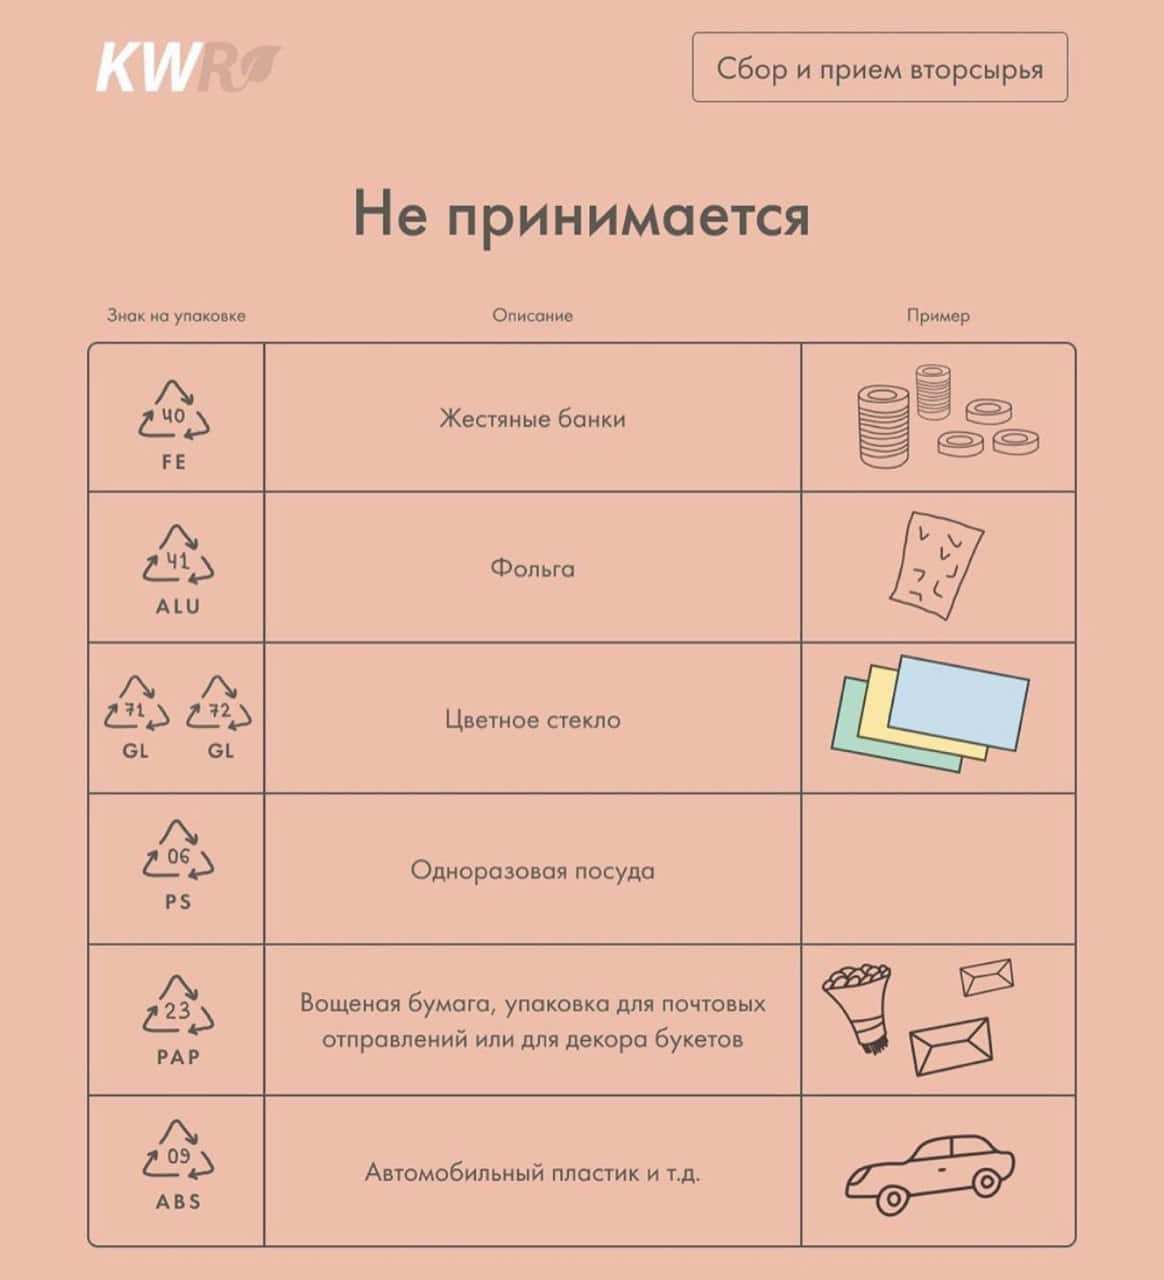 Kazakhstan Waste Recycling